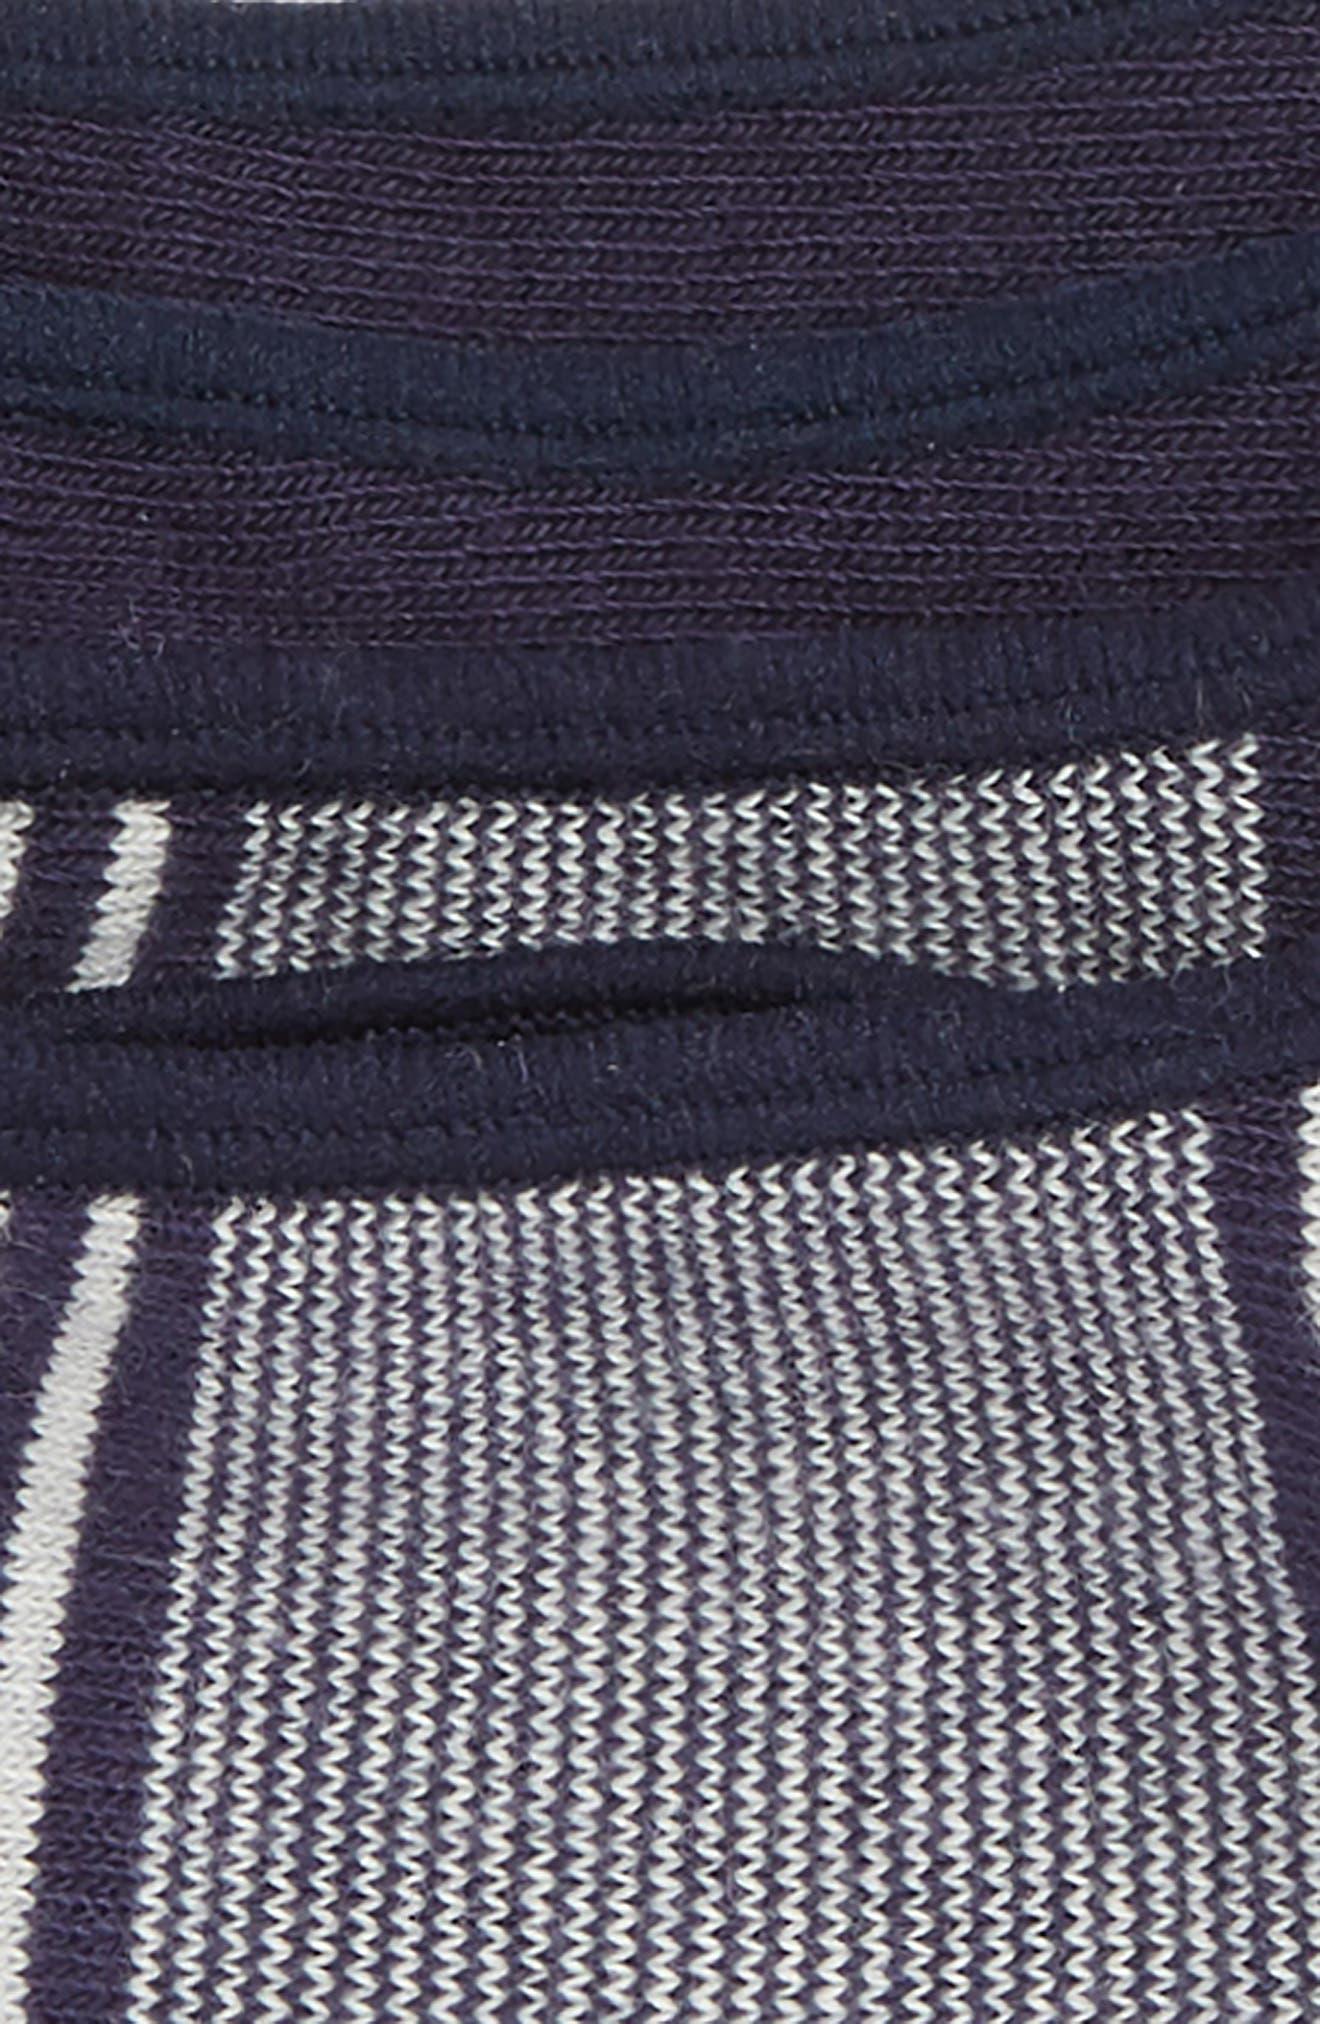 2-Pack No-Show Socks,                             Alternate thumbnail 2, color,                             MARINE BLUE